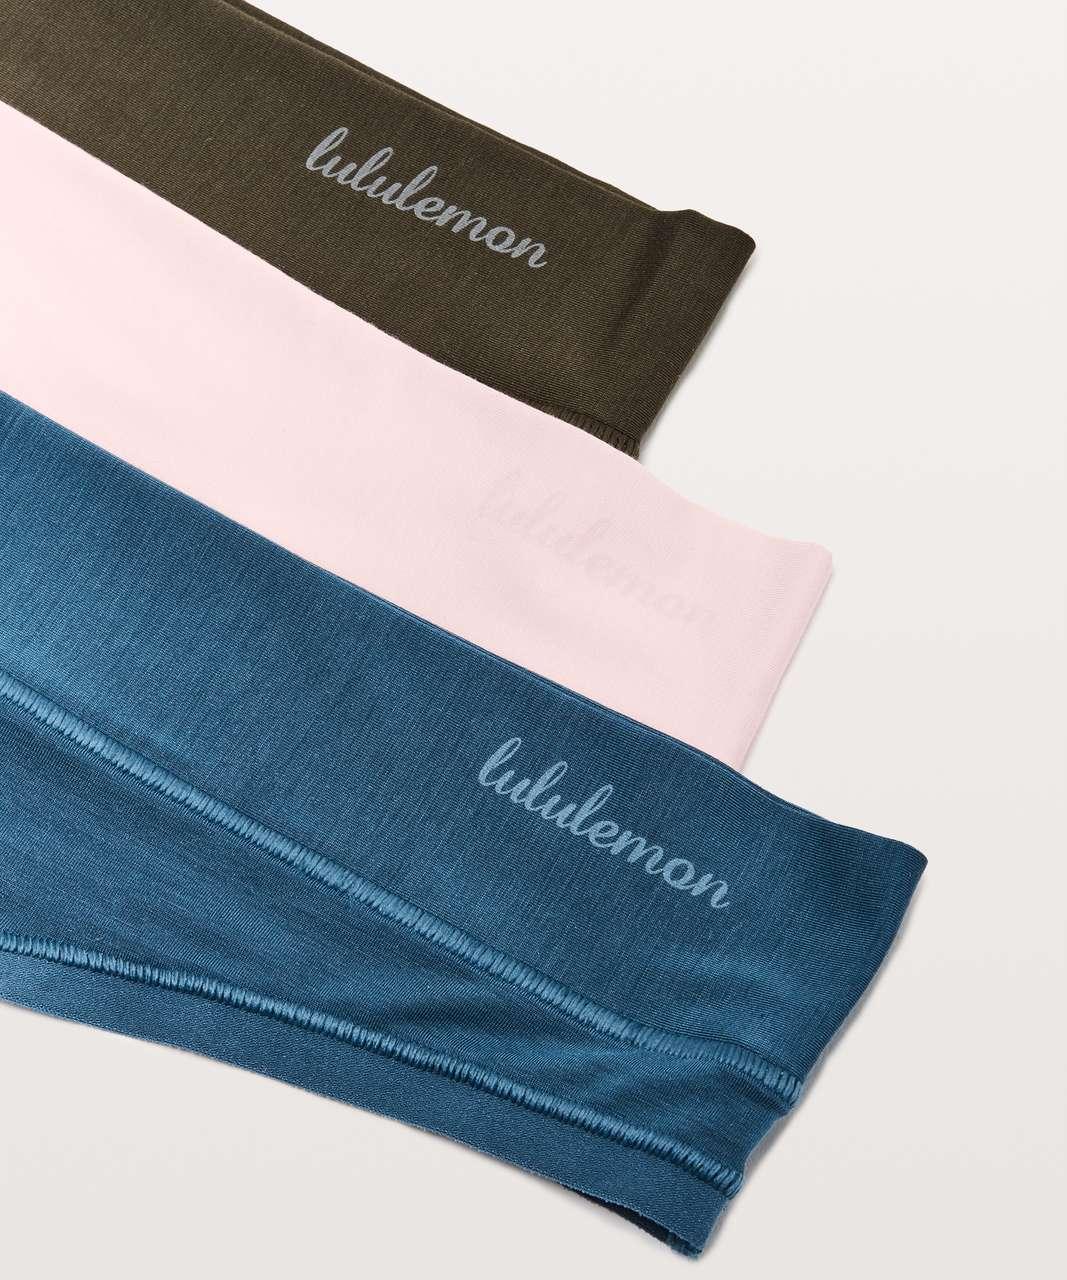 Lululemon Mula Bandhawear Thong *3 Pack - Dark Olive / Blissful Pink / Petrol Blue